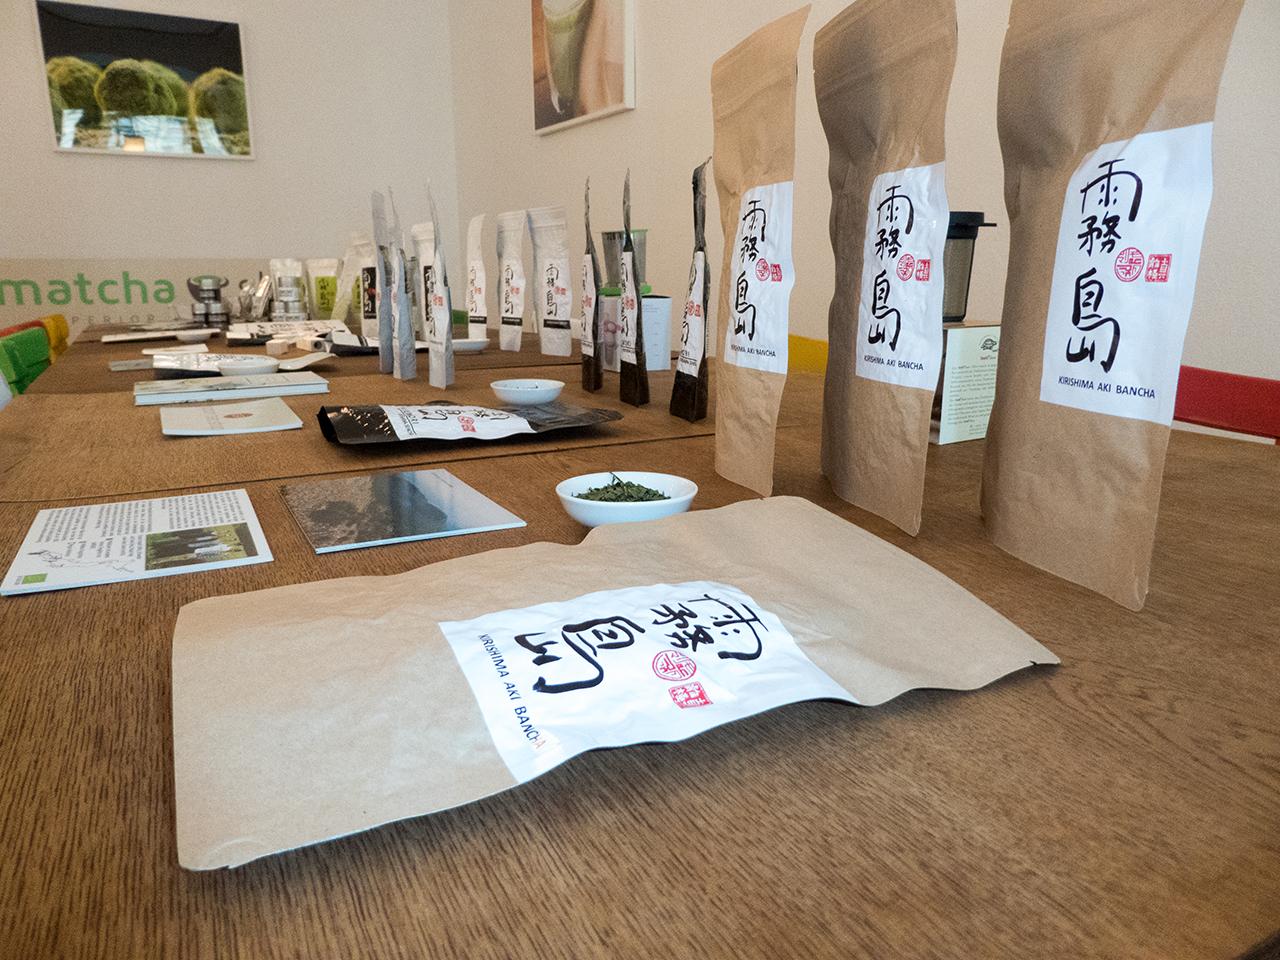 Shutaro Hayashi Matcha Teeveranstaltung